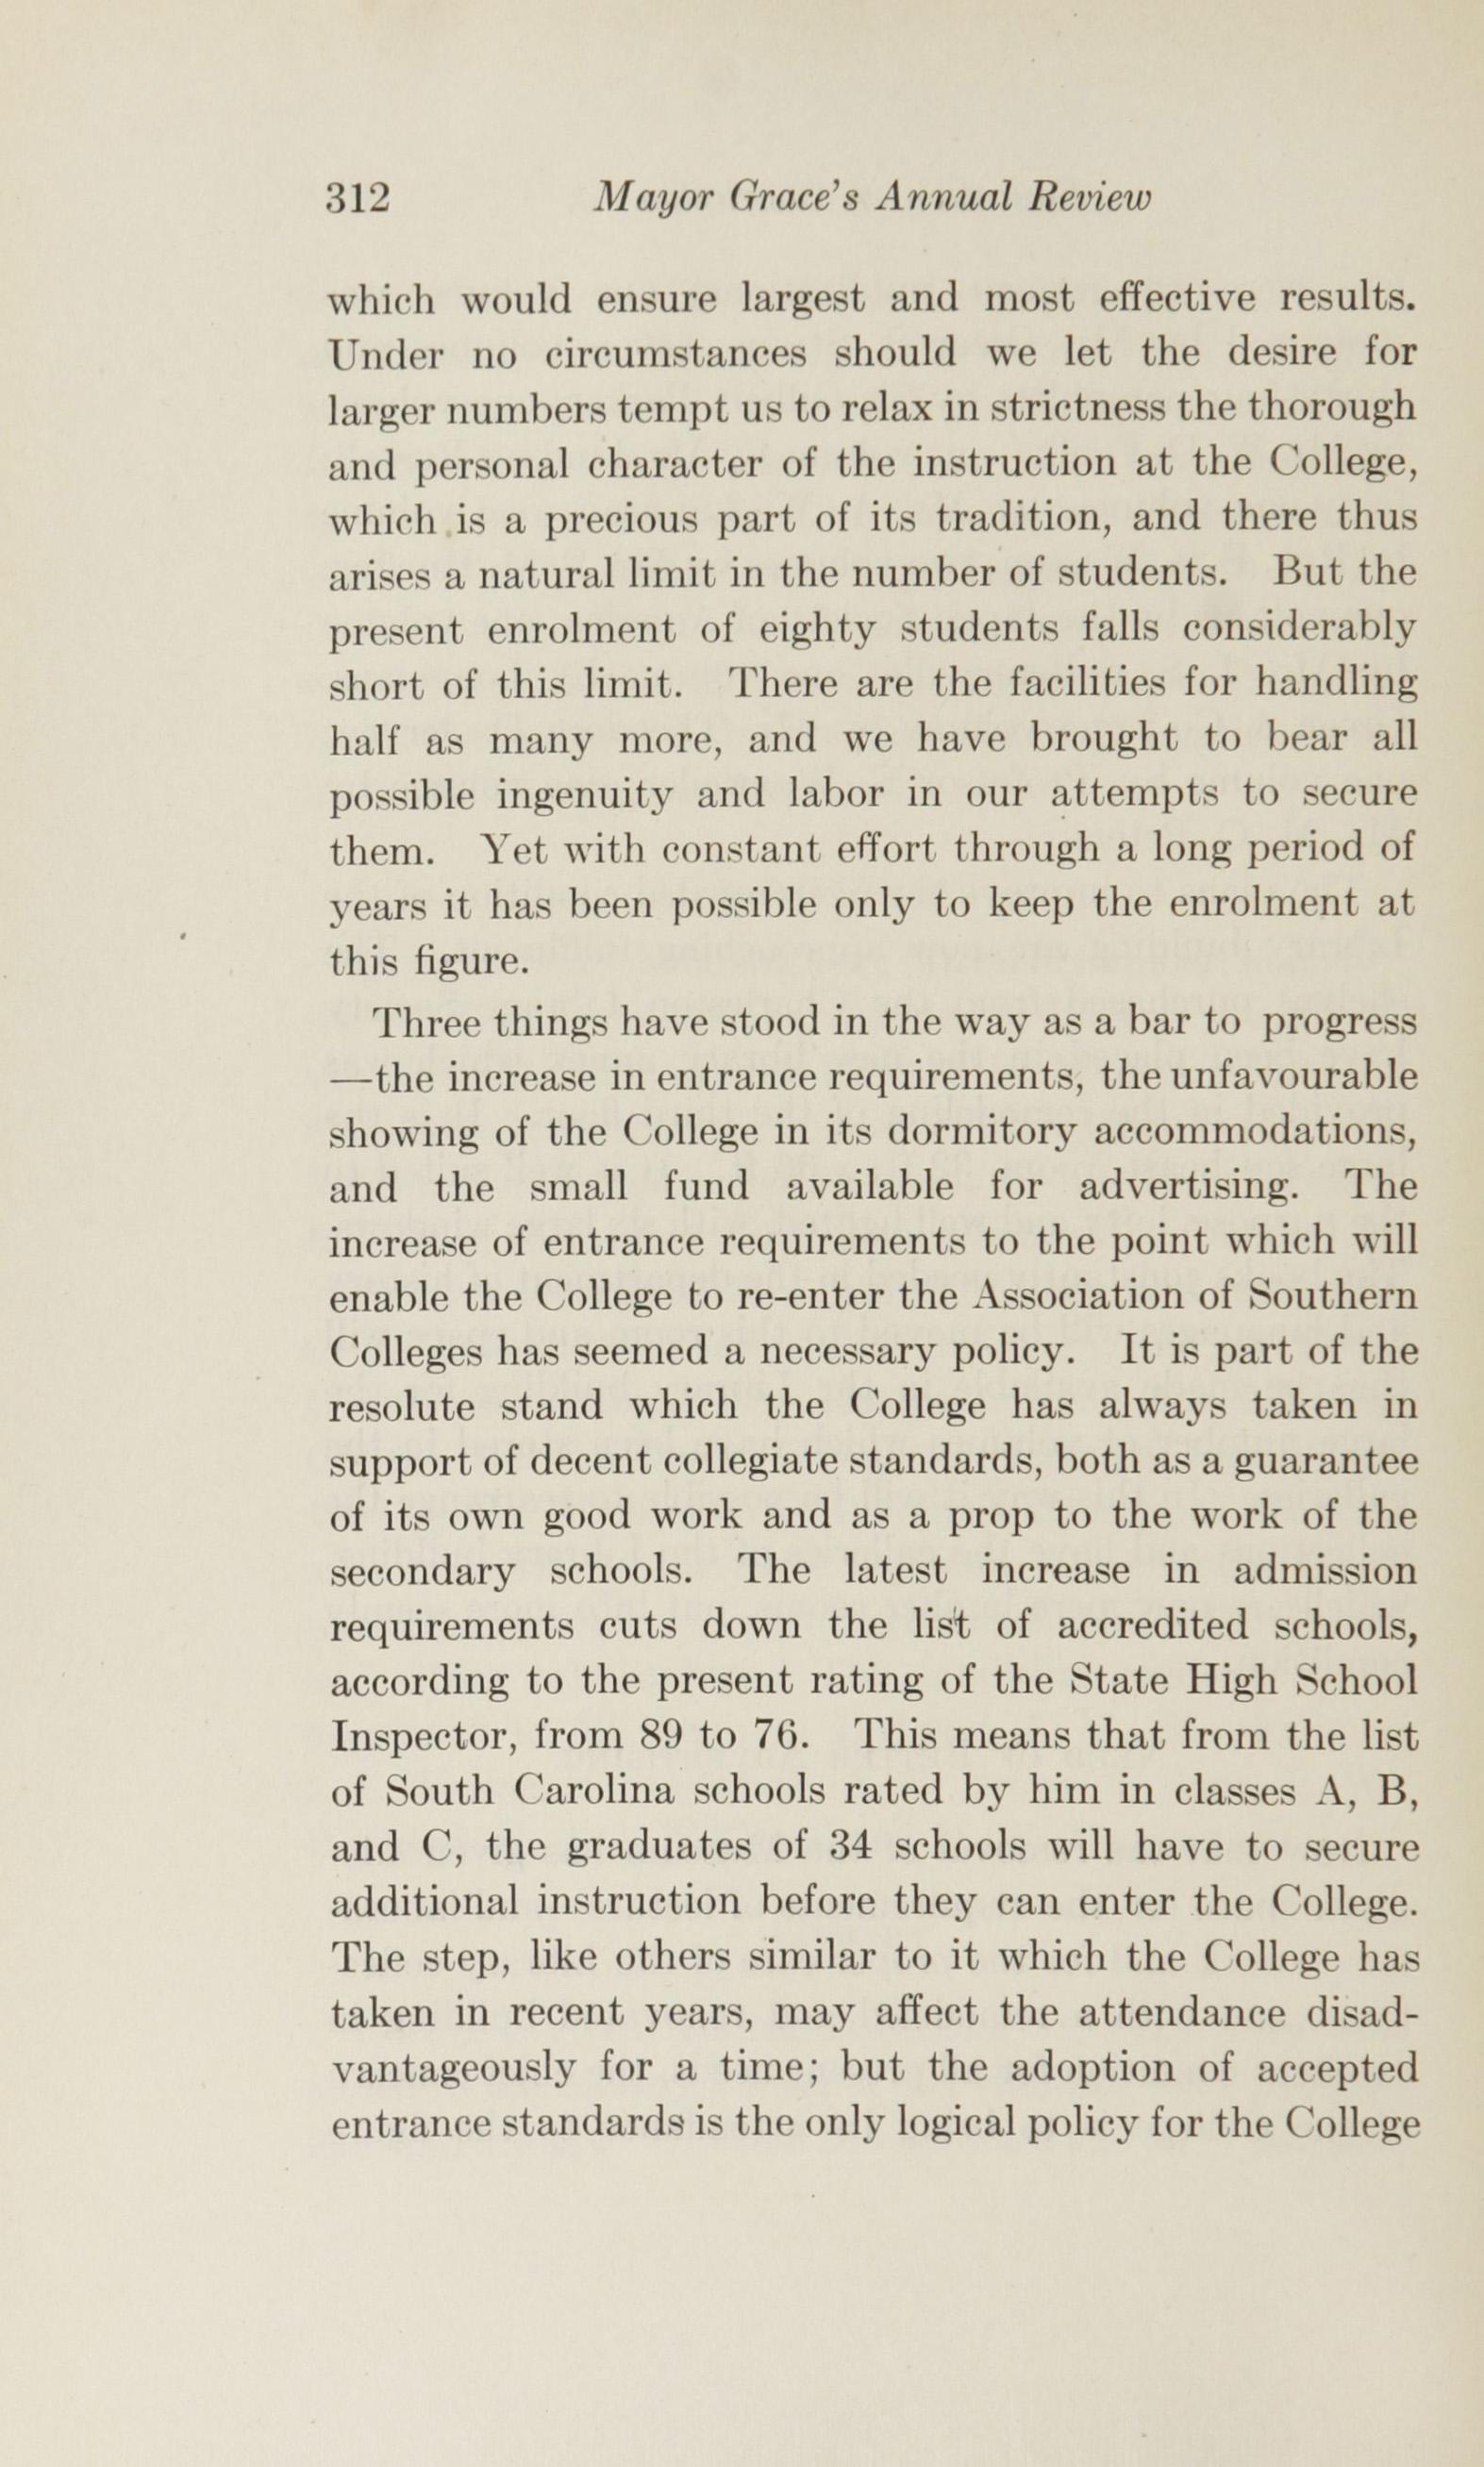 Charleston Yearbook, 1915, page 312